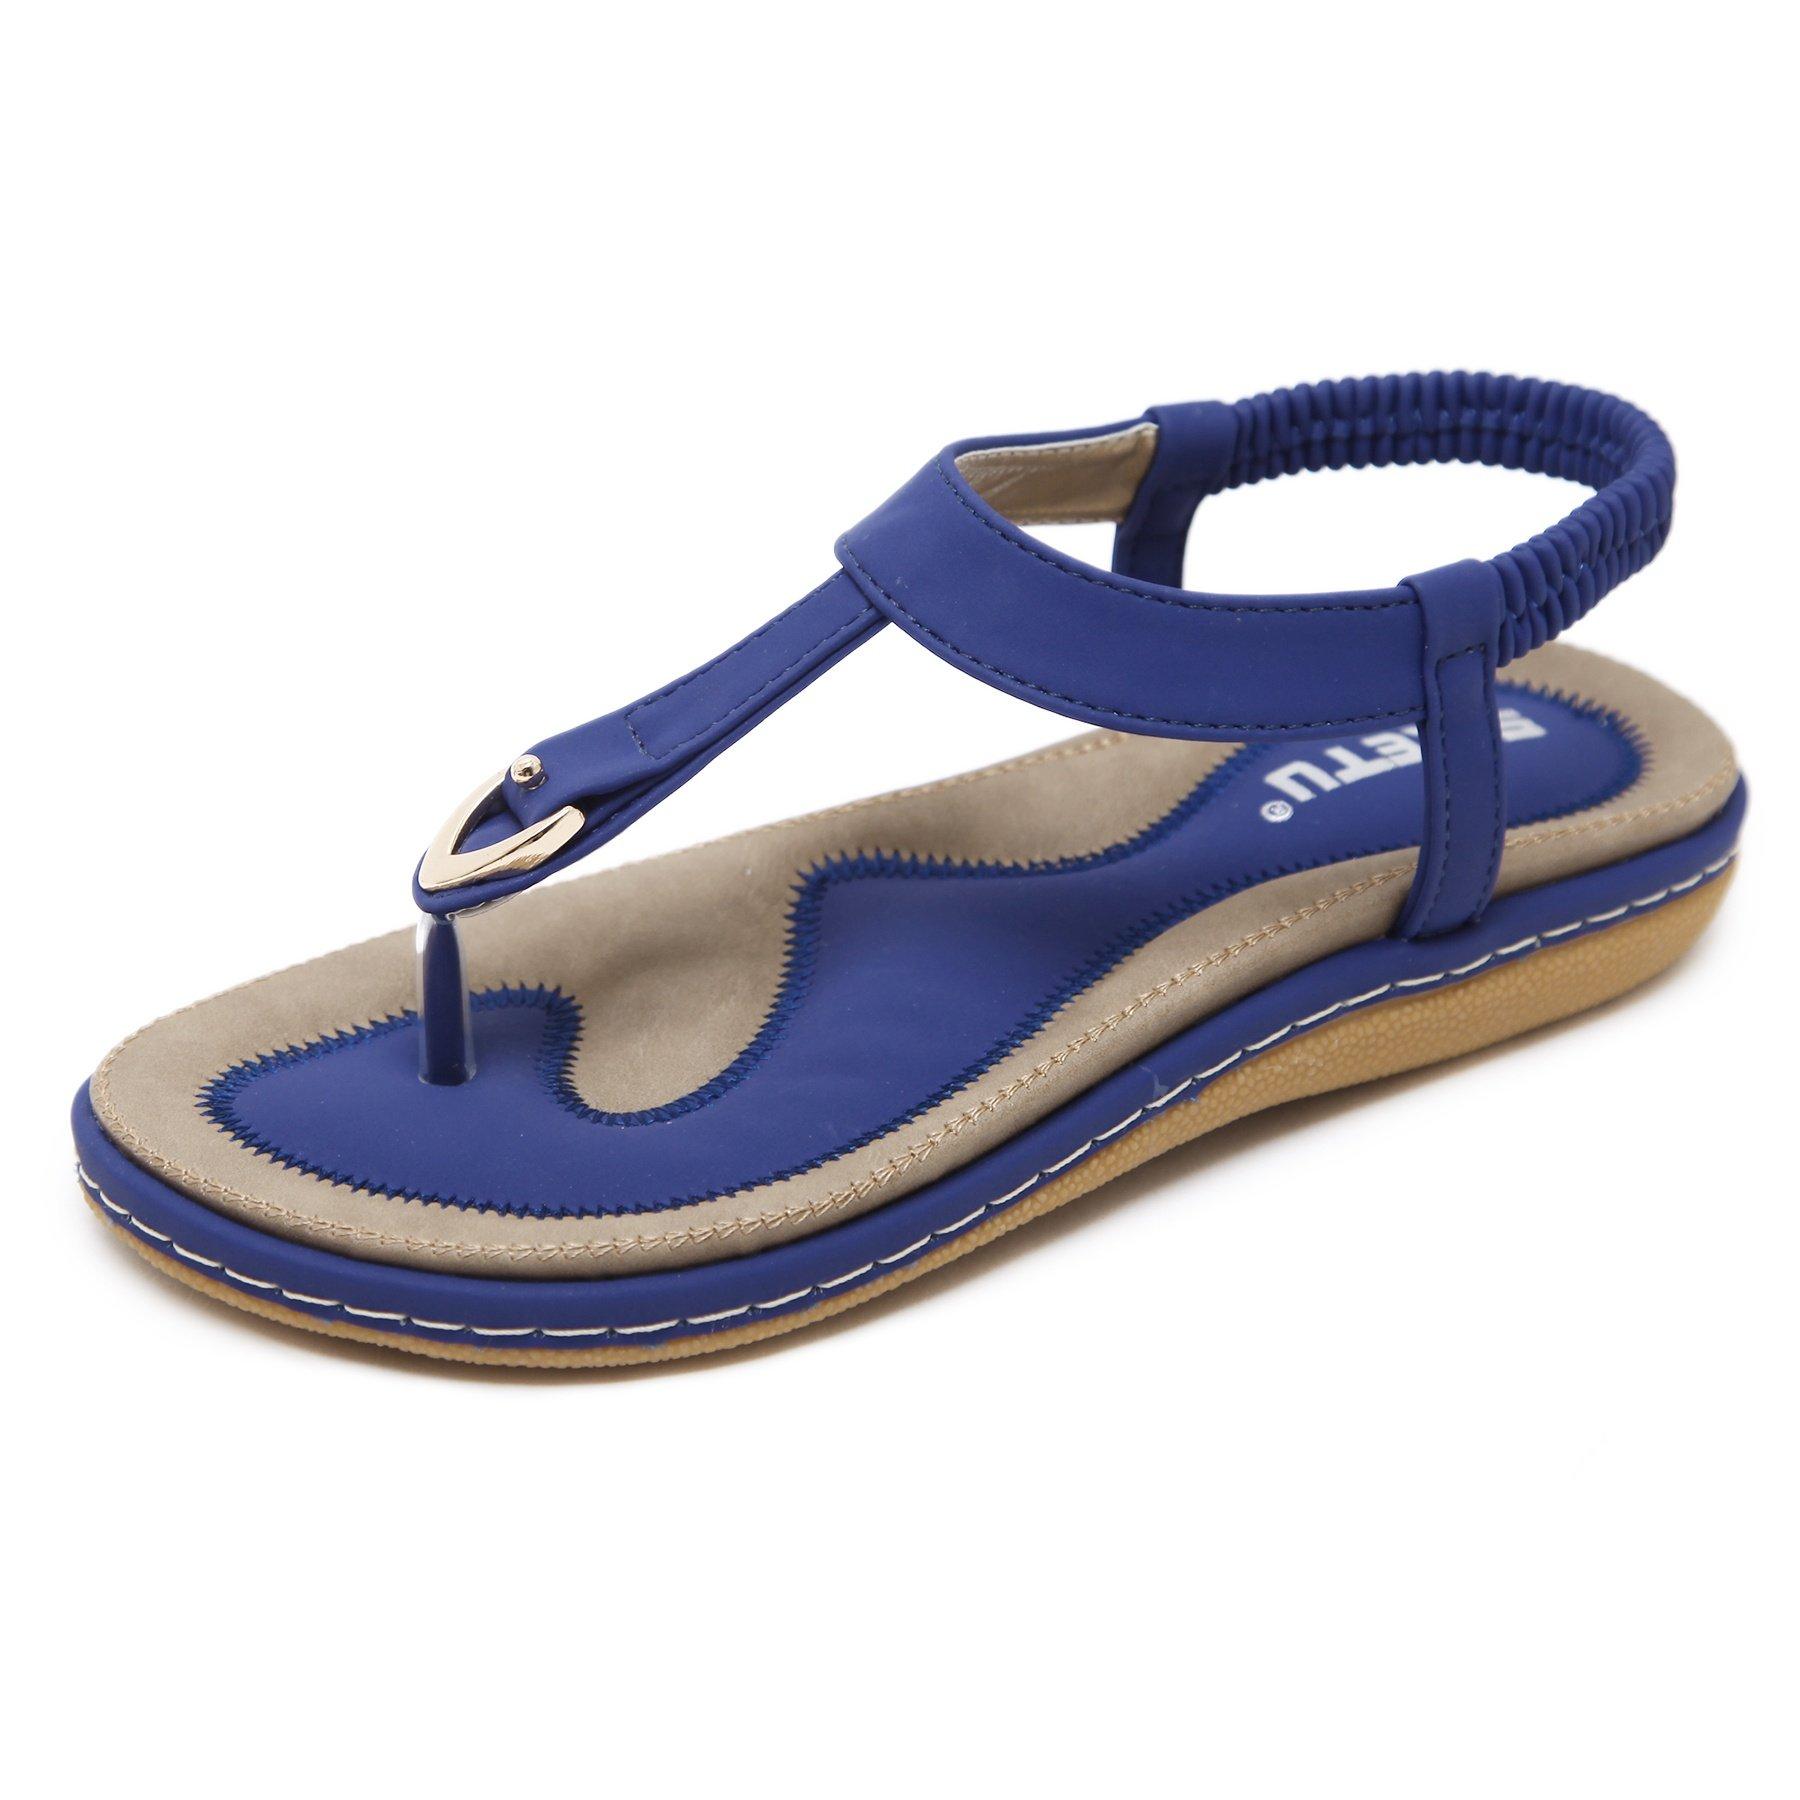 Wollanlily Women Summer Beach Flat Sandals T-Strap Elastic Ankle Strap Flip-Flop Thong Shoes Blue-01 US 9